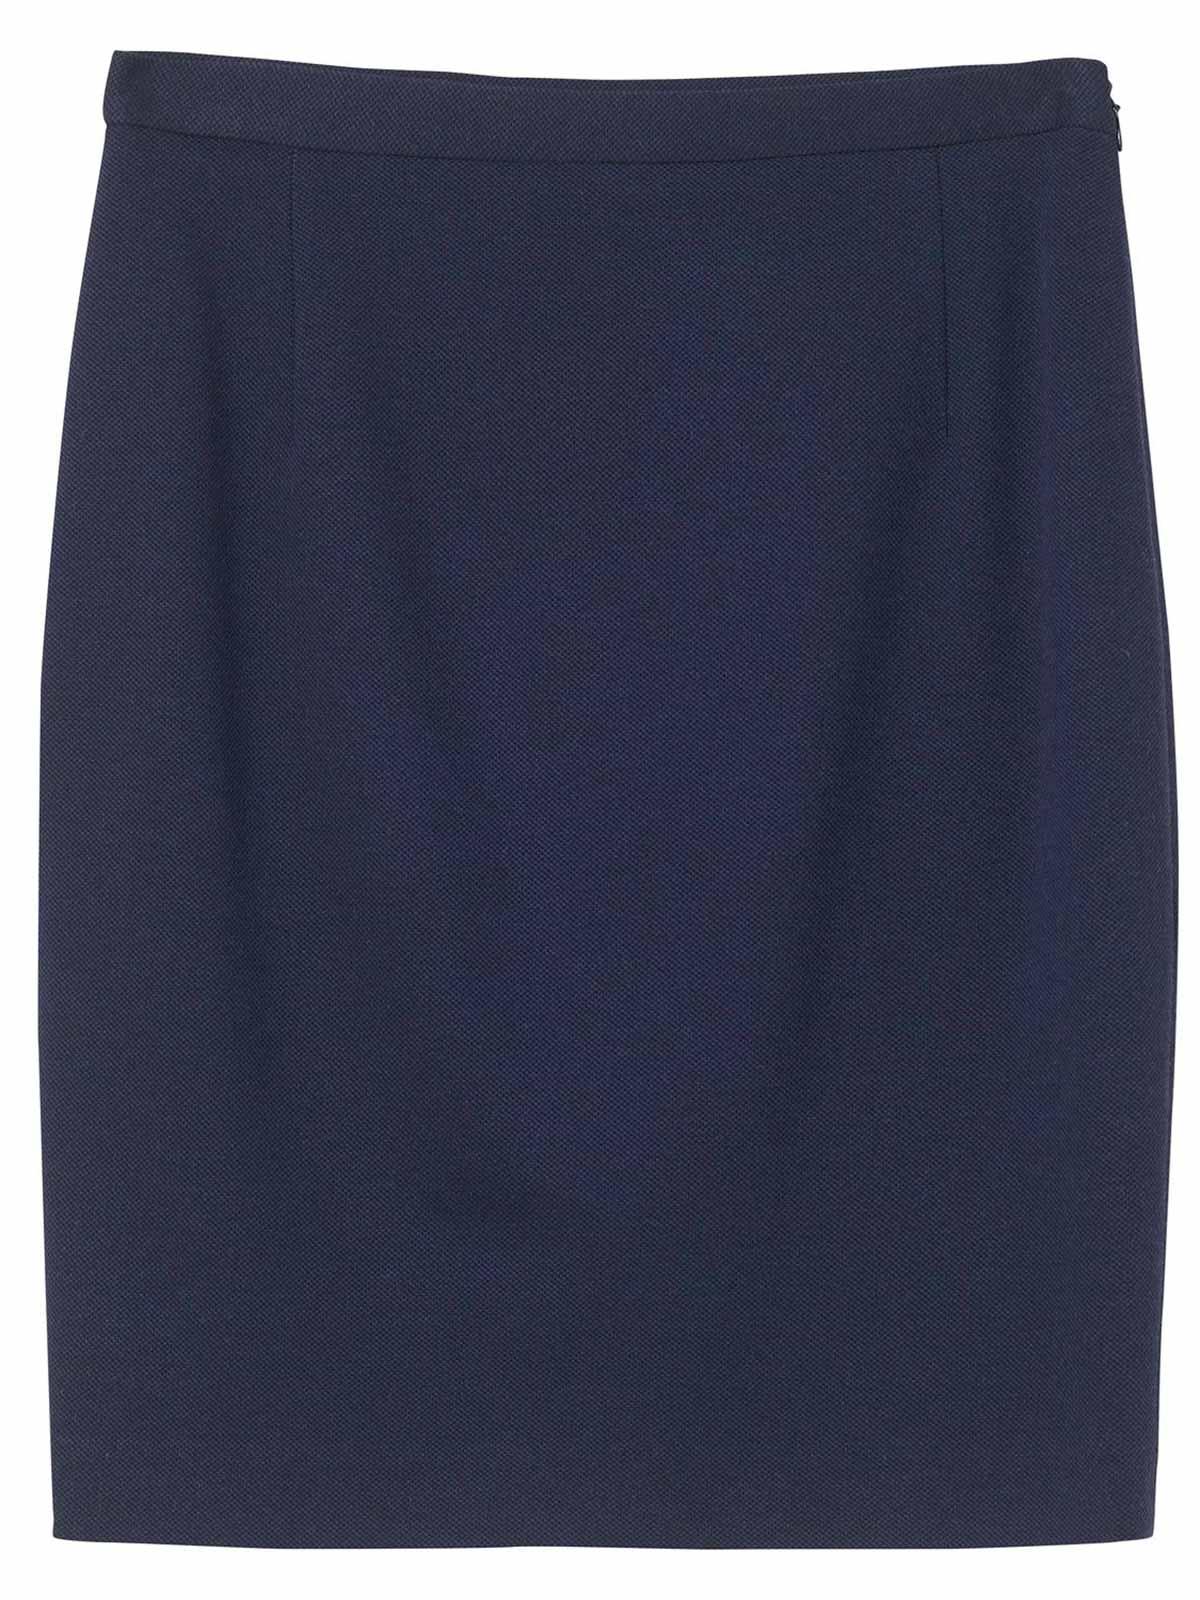 Picture of GANT | Women's Piqué Skirt